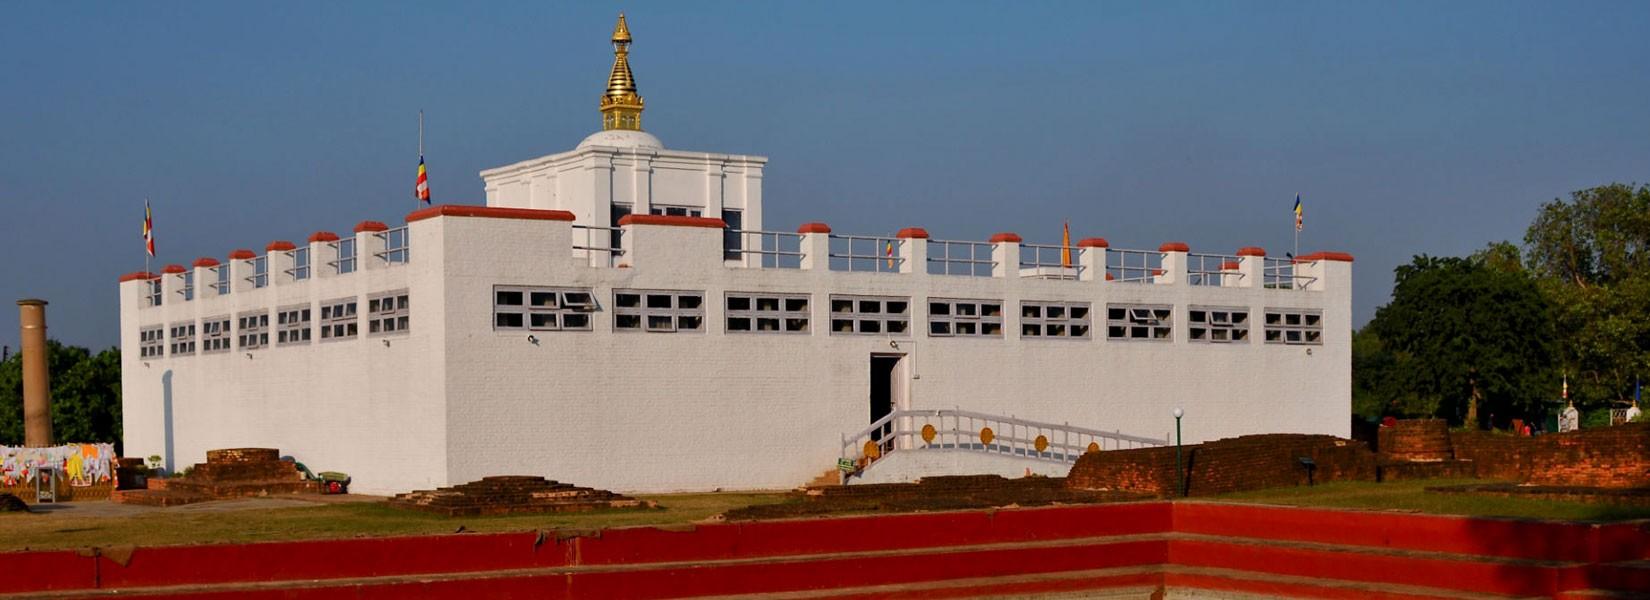 Kathmandu, Chitwan and Lumbini Tour